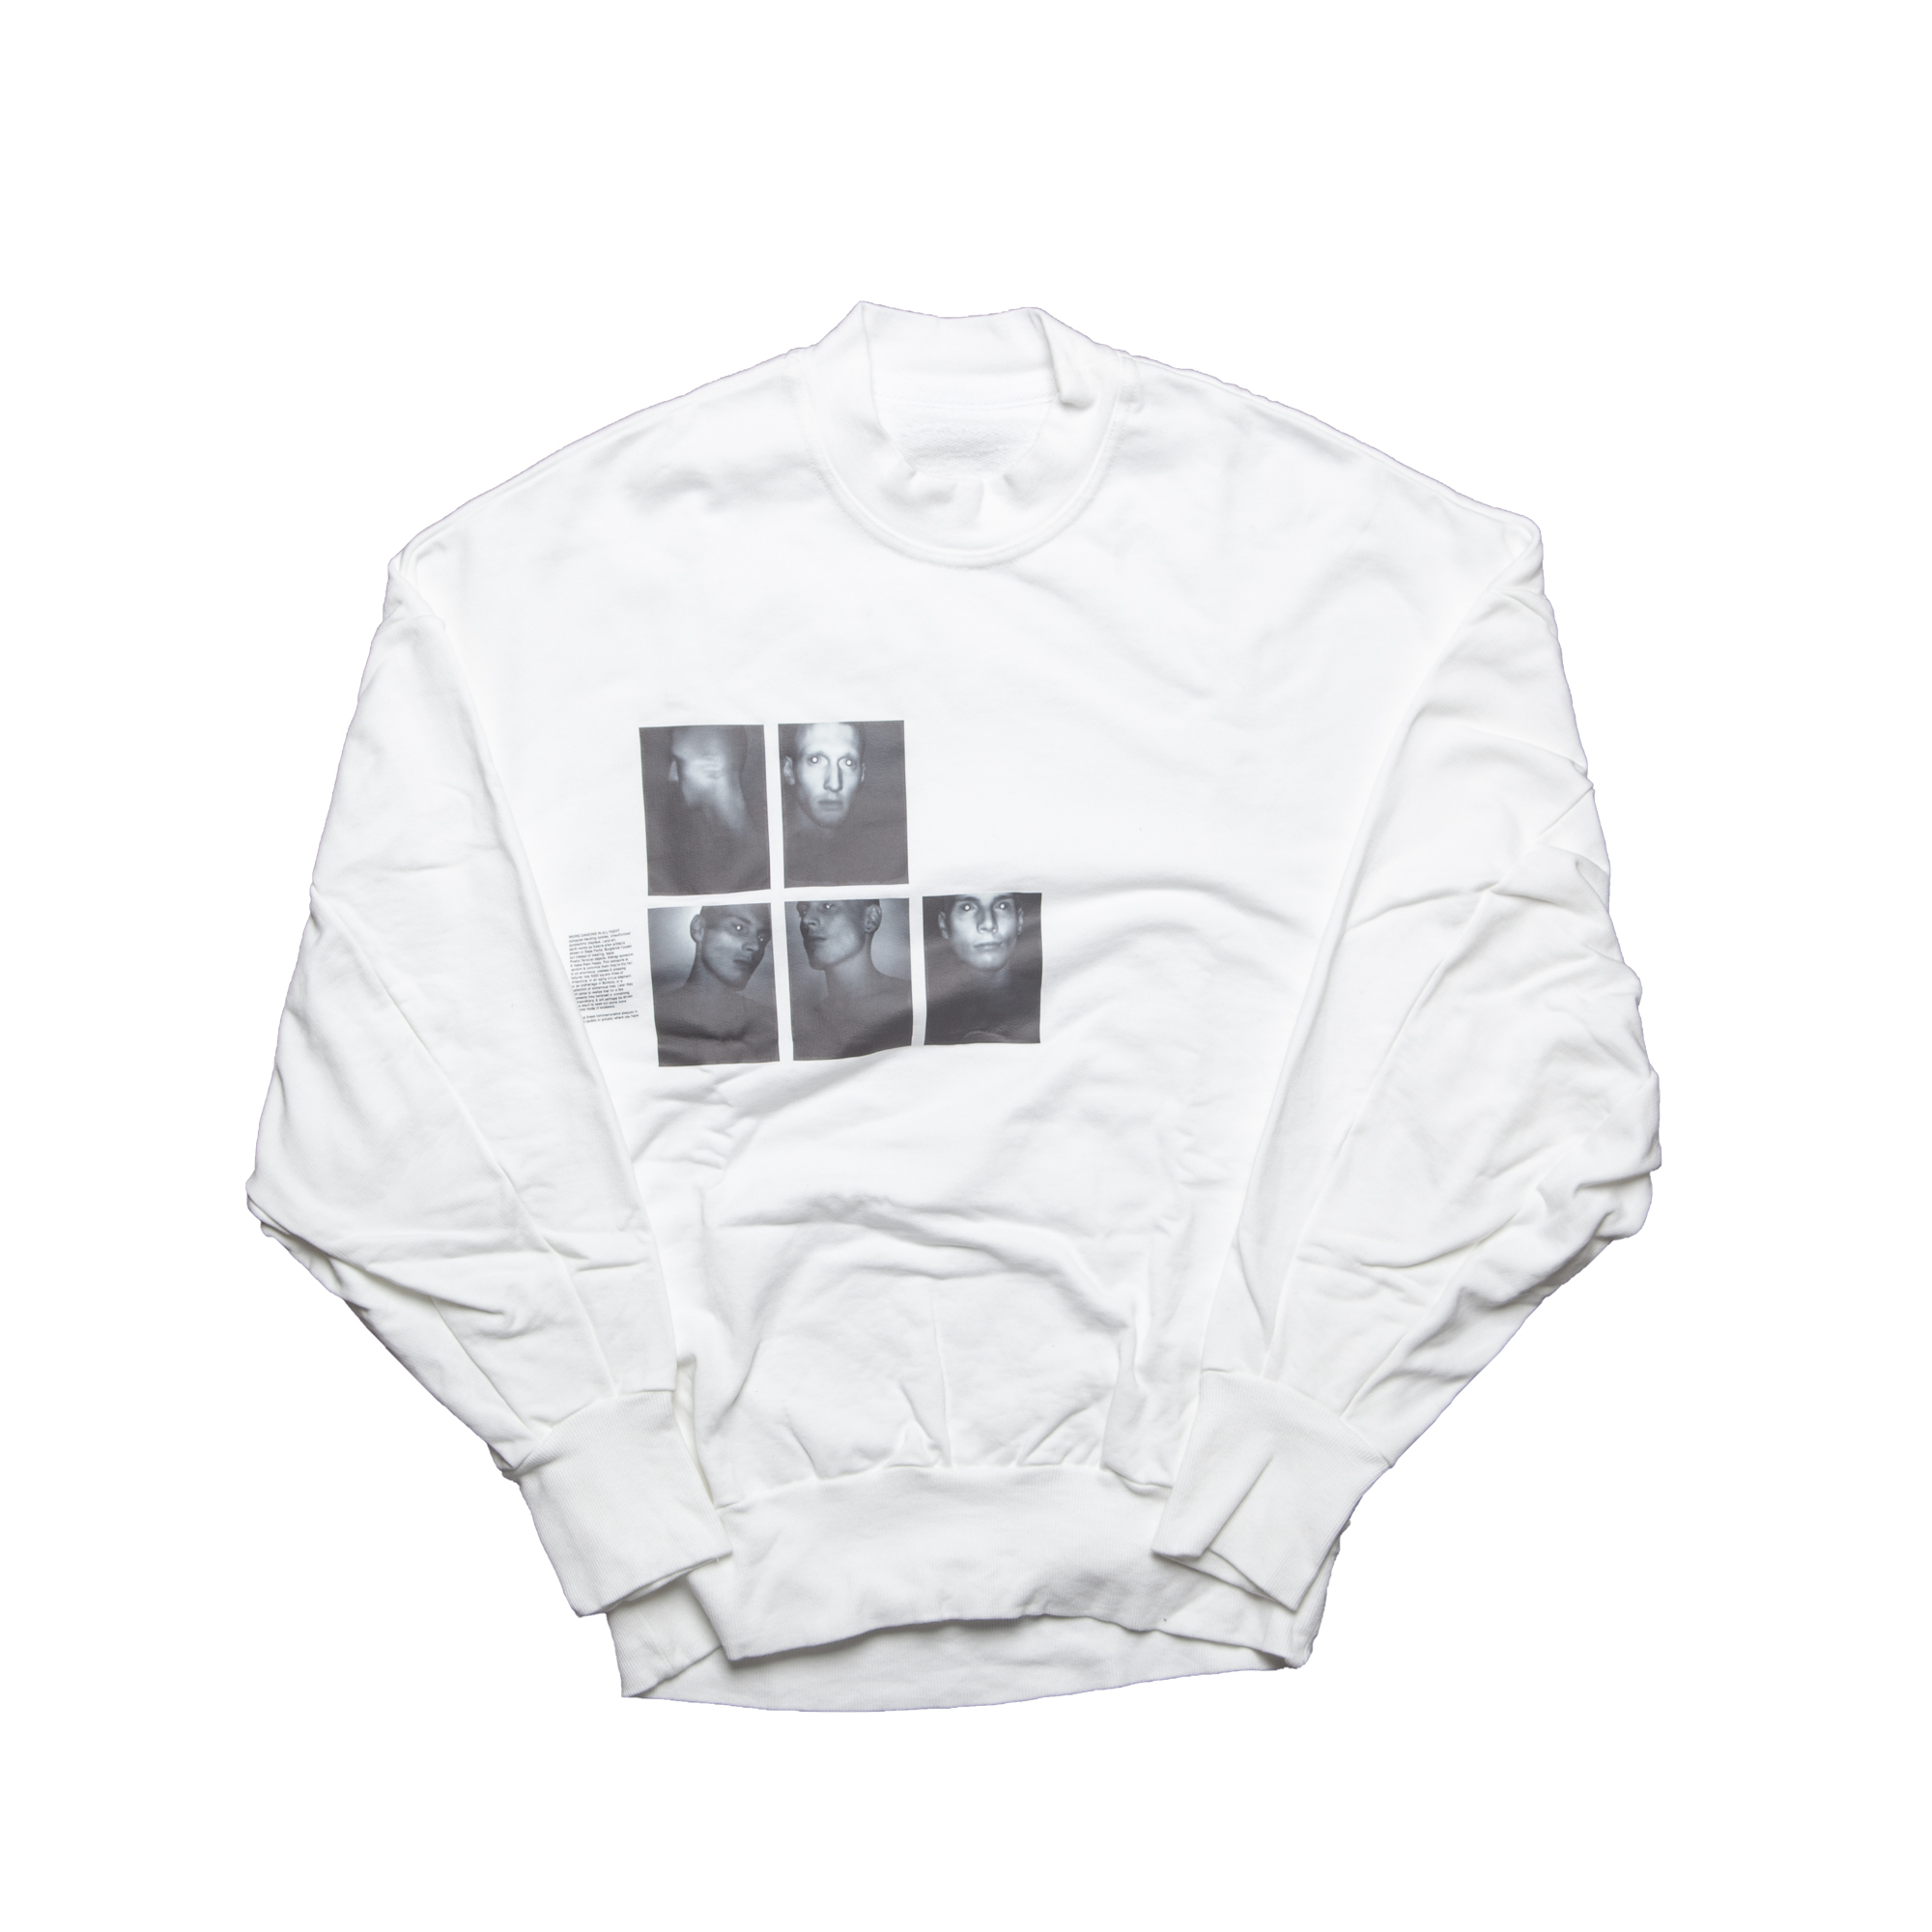 677CPM3-WHITE / P. T. バルーンスウェットシャツ